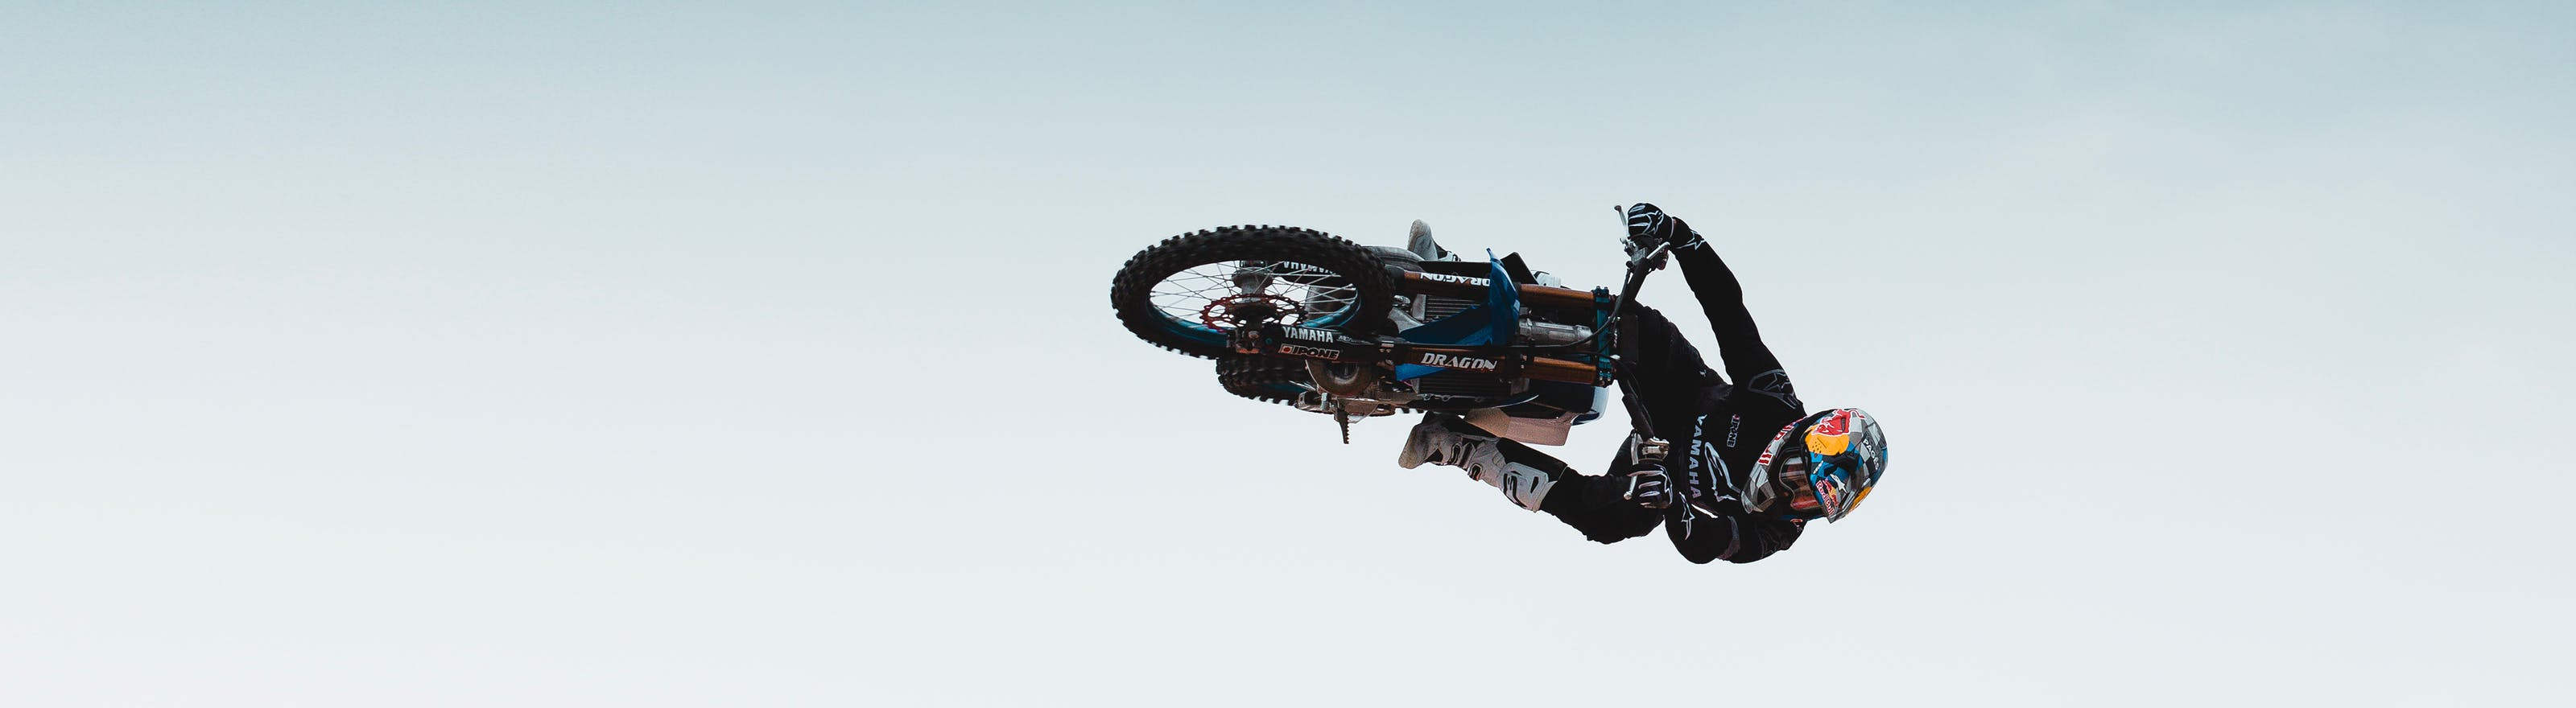 Figure moto FMX